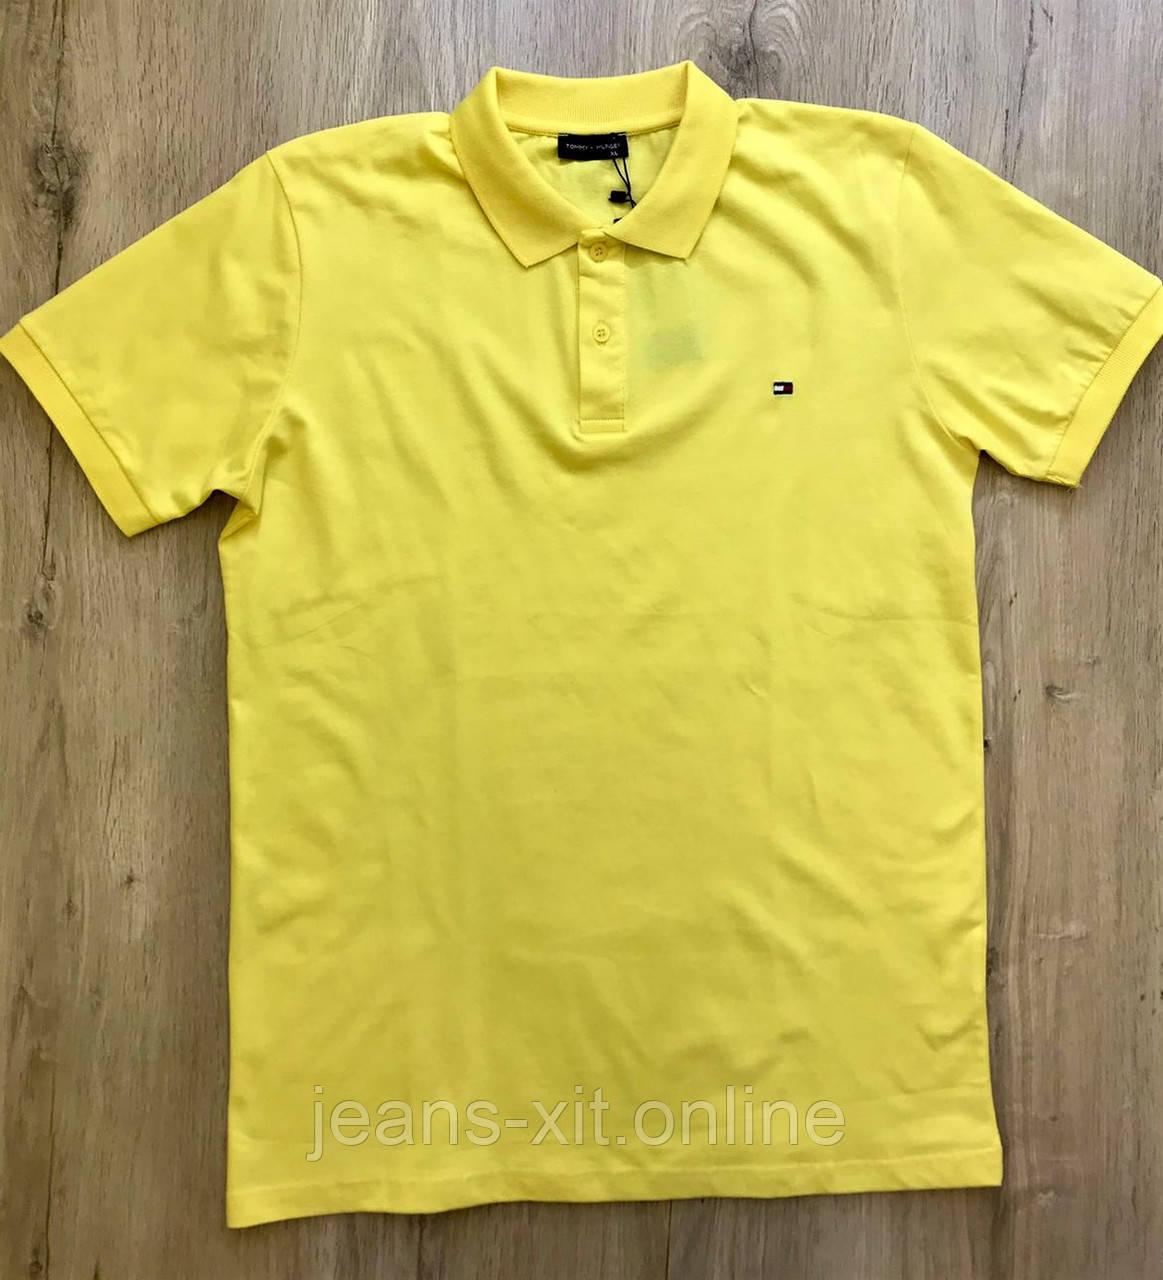 Футболка чоловіча 2XL(р) жовта 1445-20 Tommy Hilfiger Туреччина Літо-C